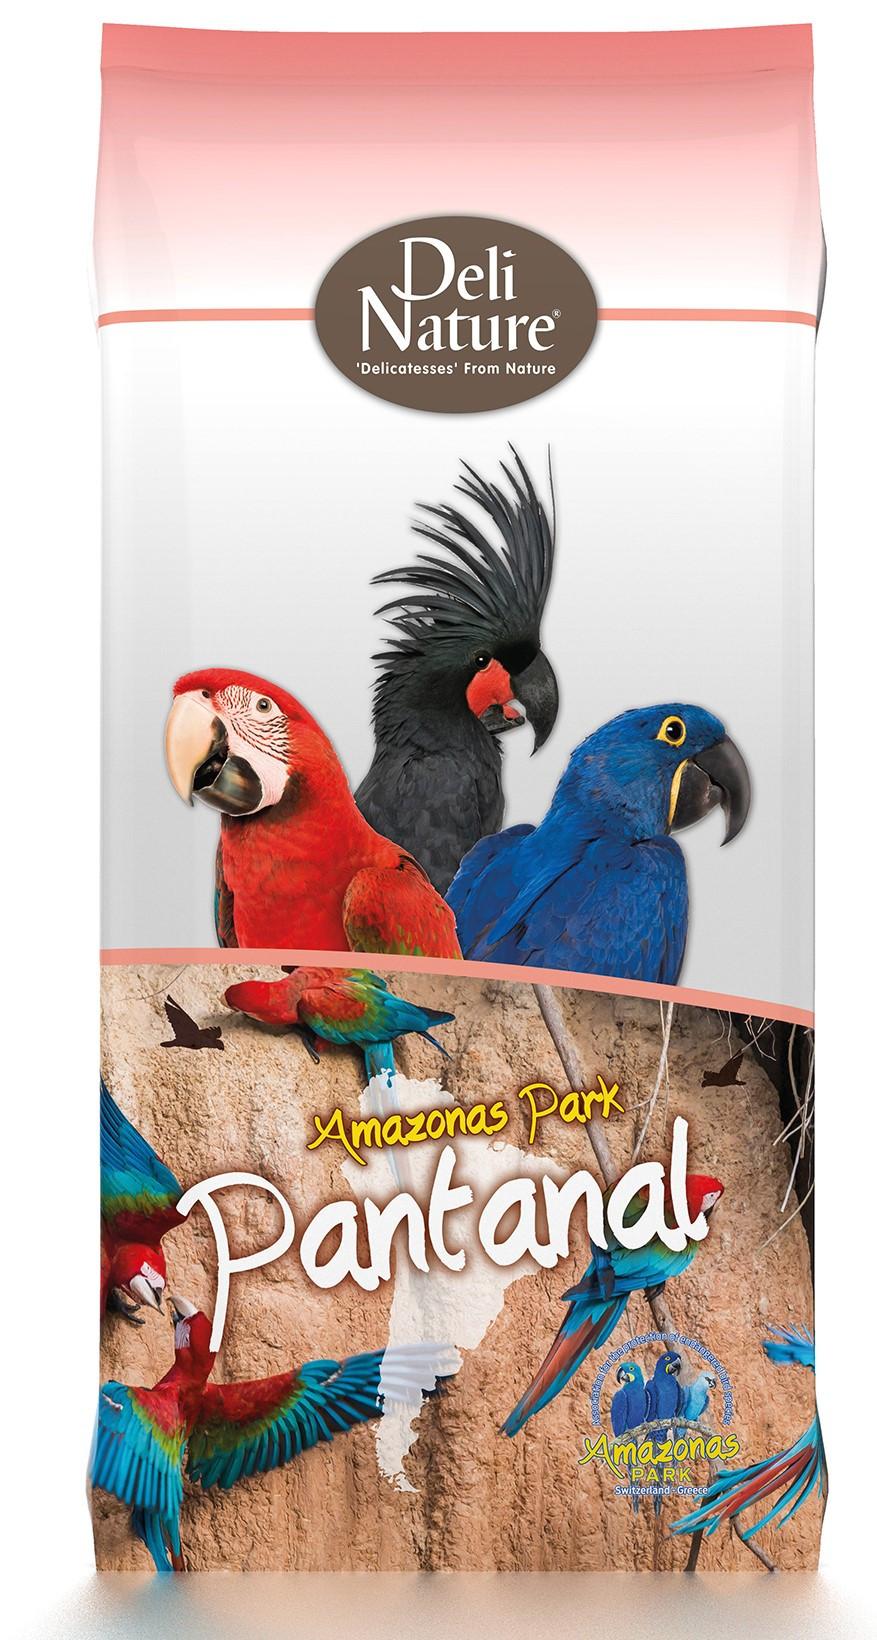 Deli Nature Amazonas Park Pantanal 2 kg